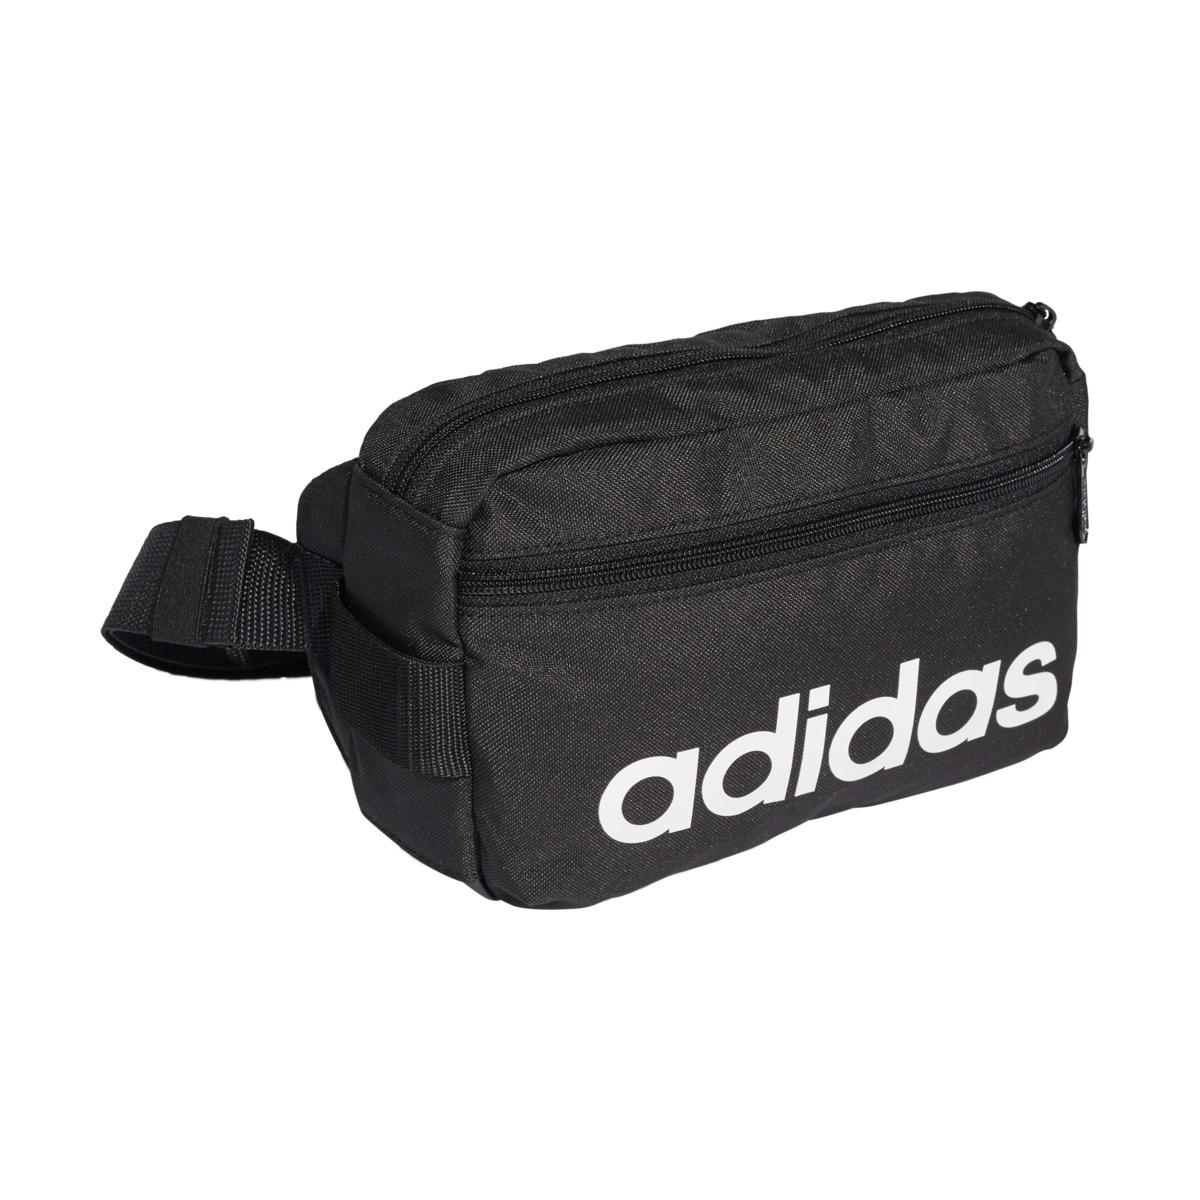 571c3c03ffb Adidas - Black Linear Core Toiletry Bag for Men - Lyst. View fullscreen